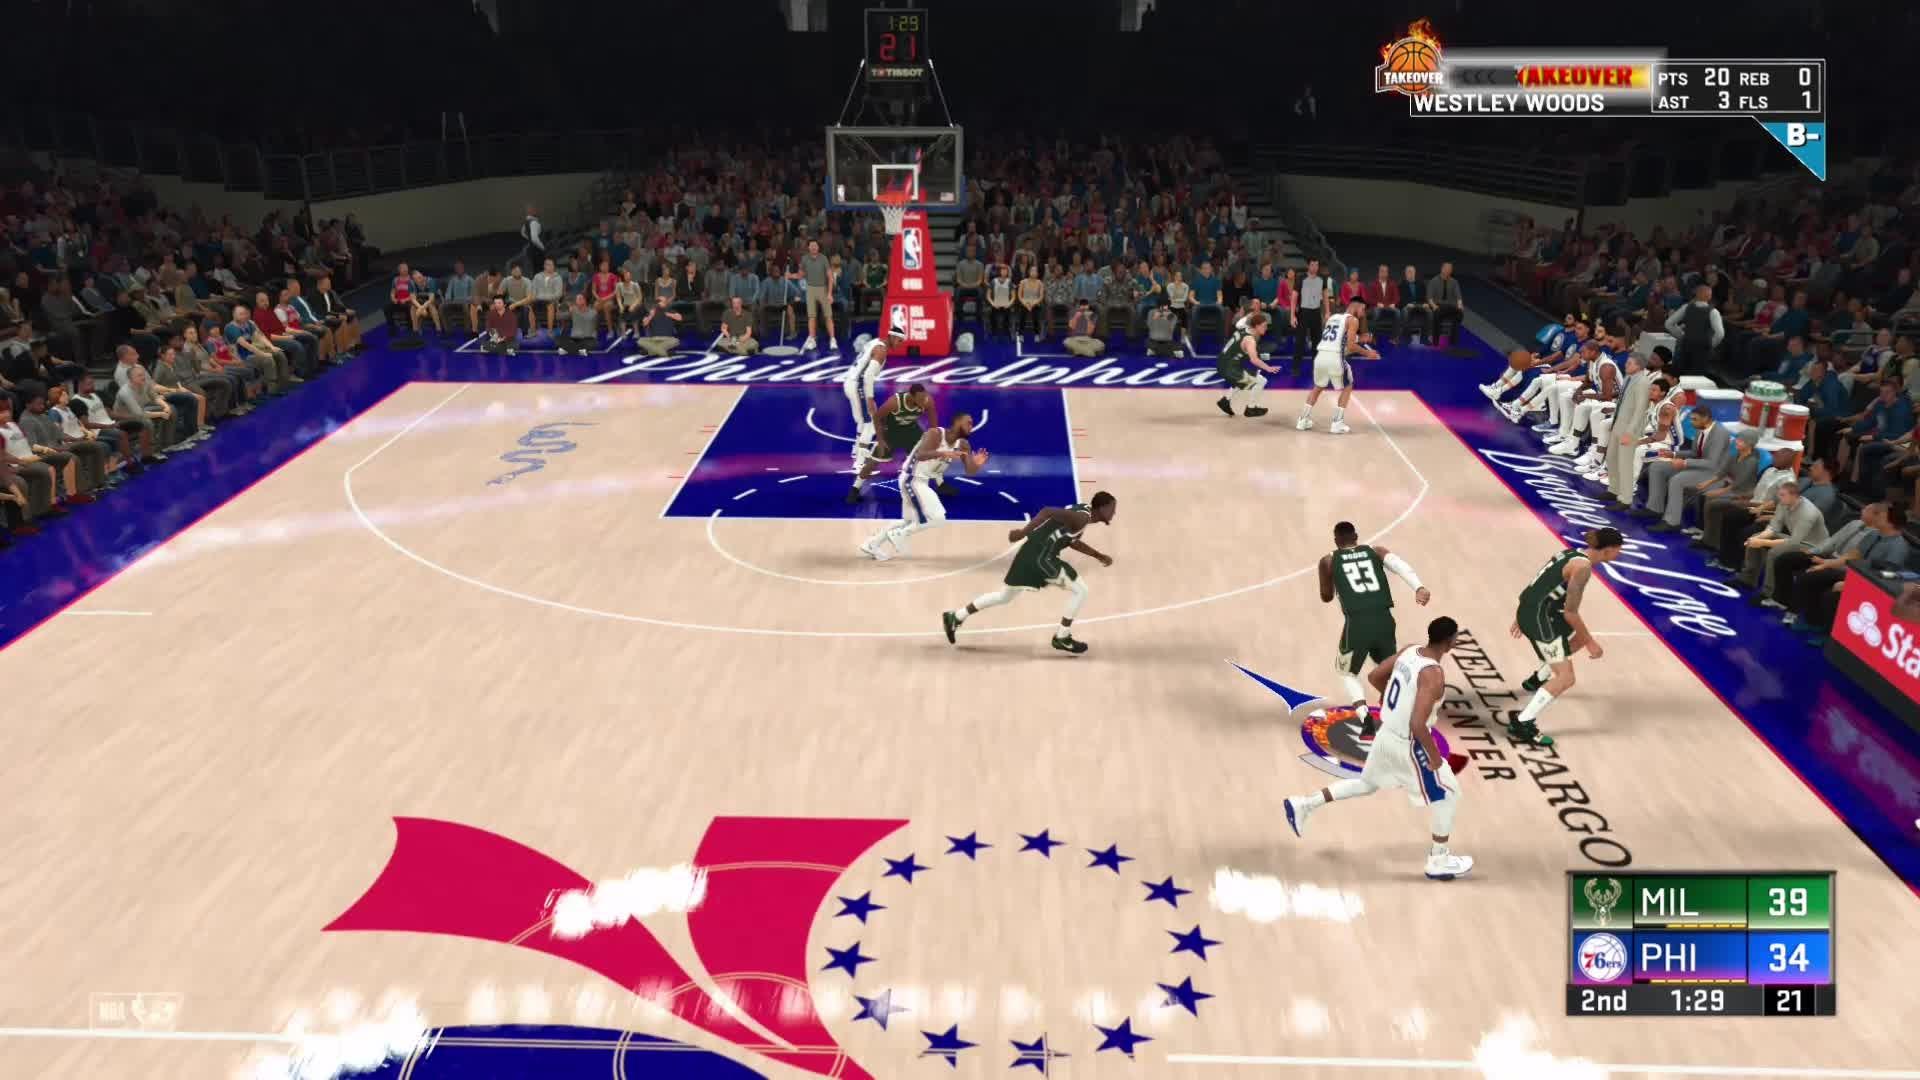 NBA 2K: MyCareer - The Park not ready video cover image 0